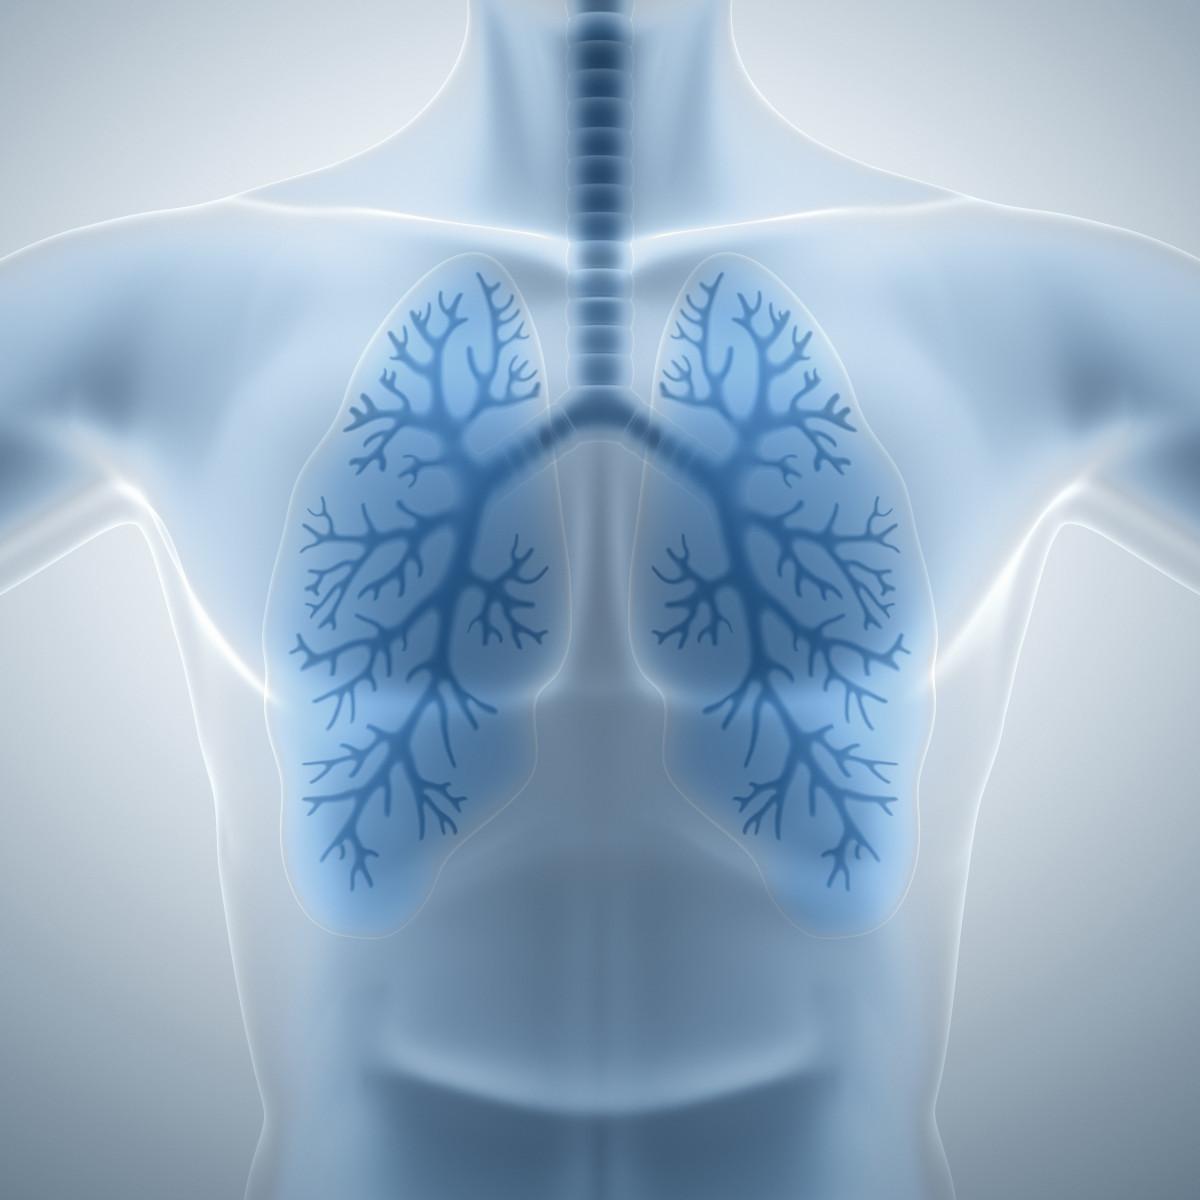 LCI and blood oxygen levels